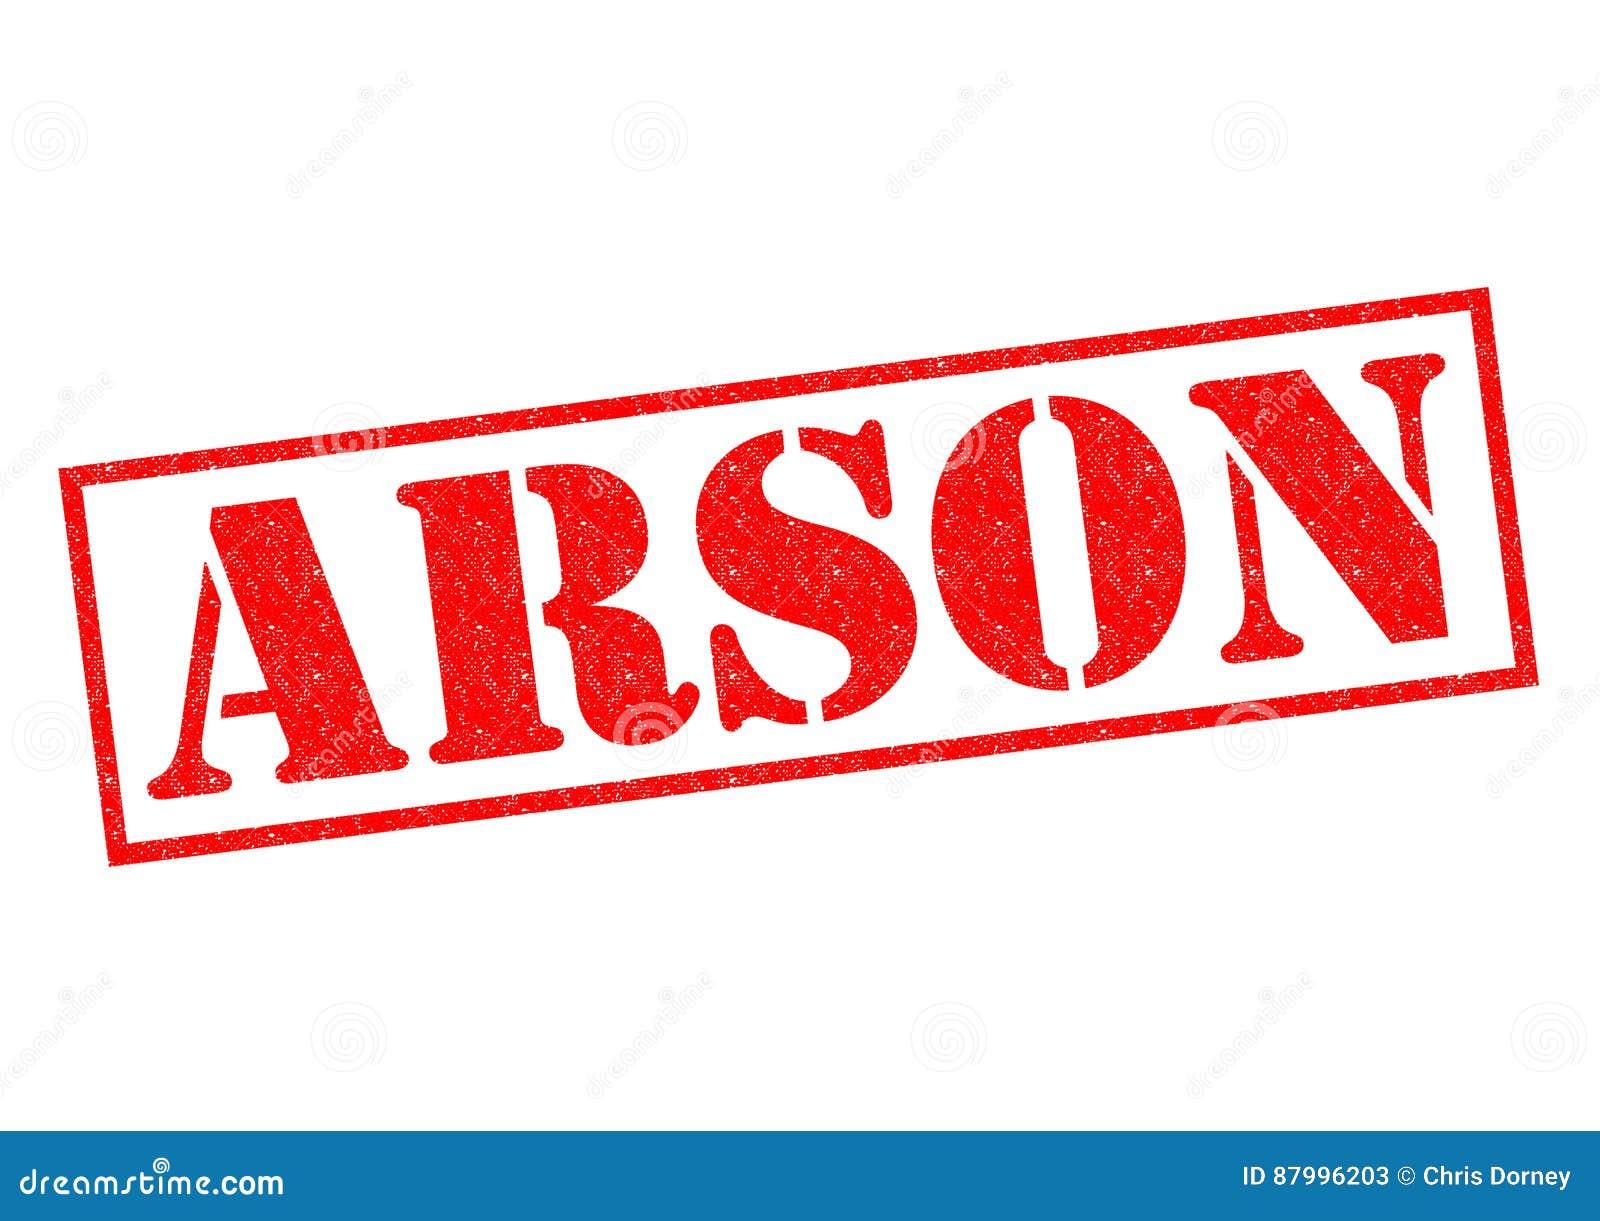 ARSON Rubber Stamp